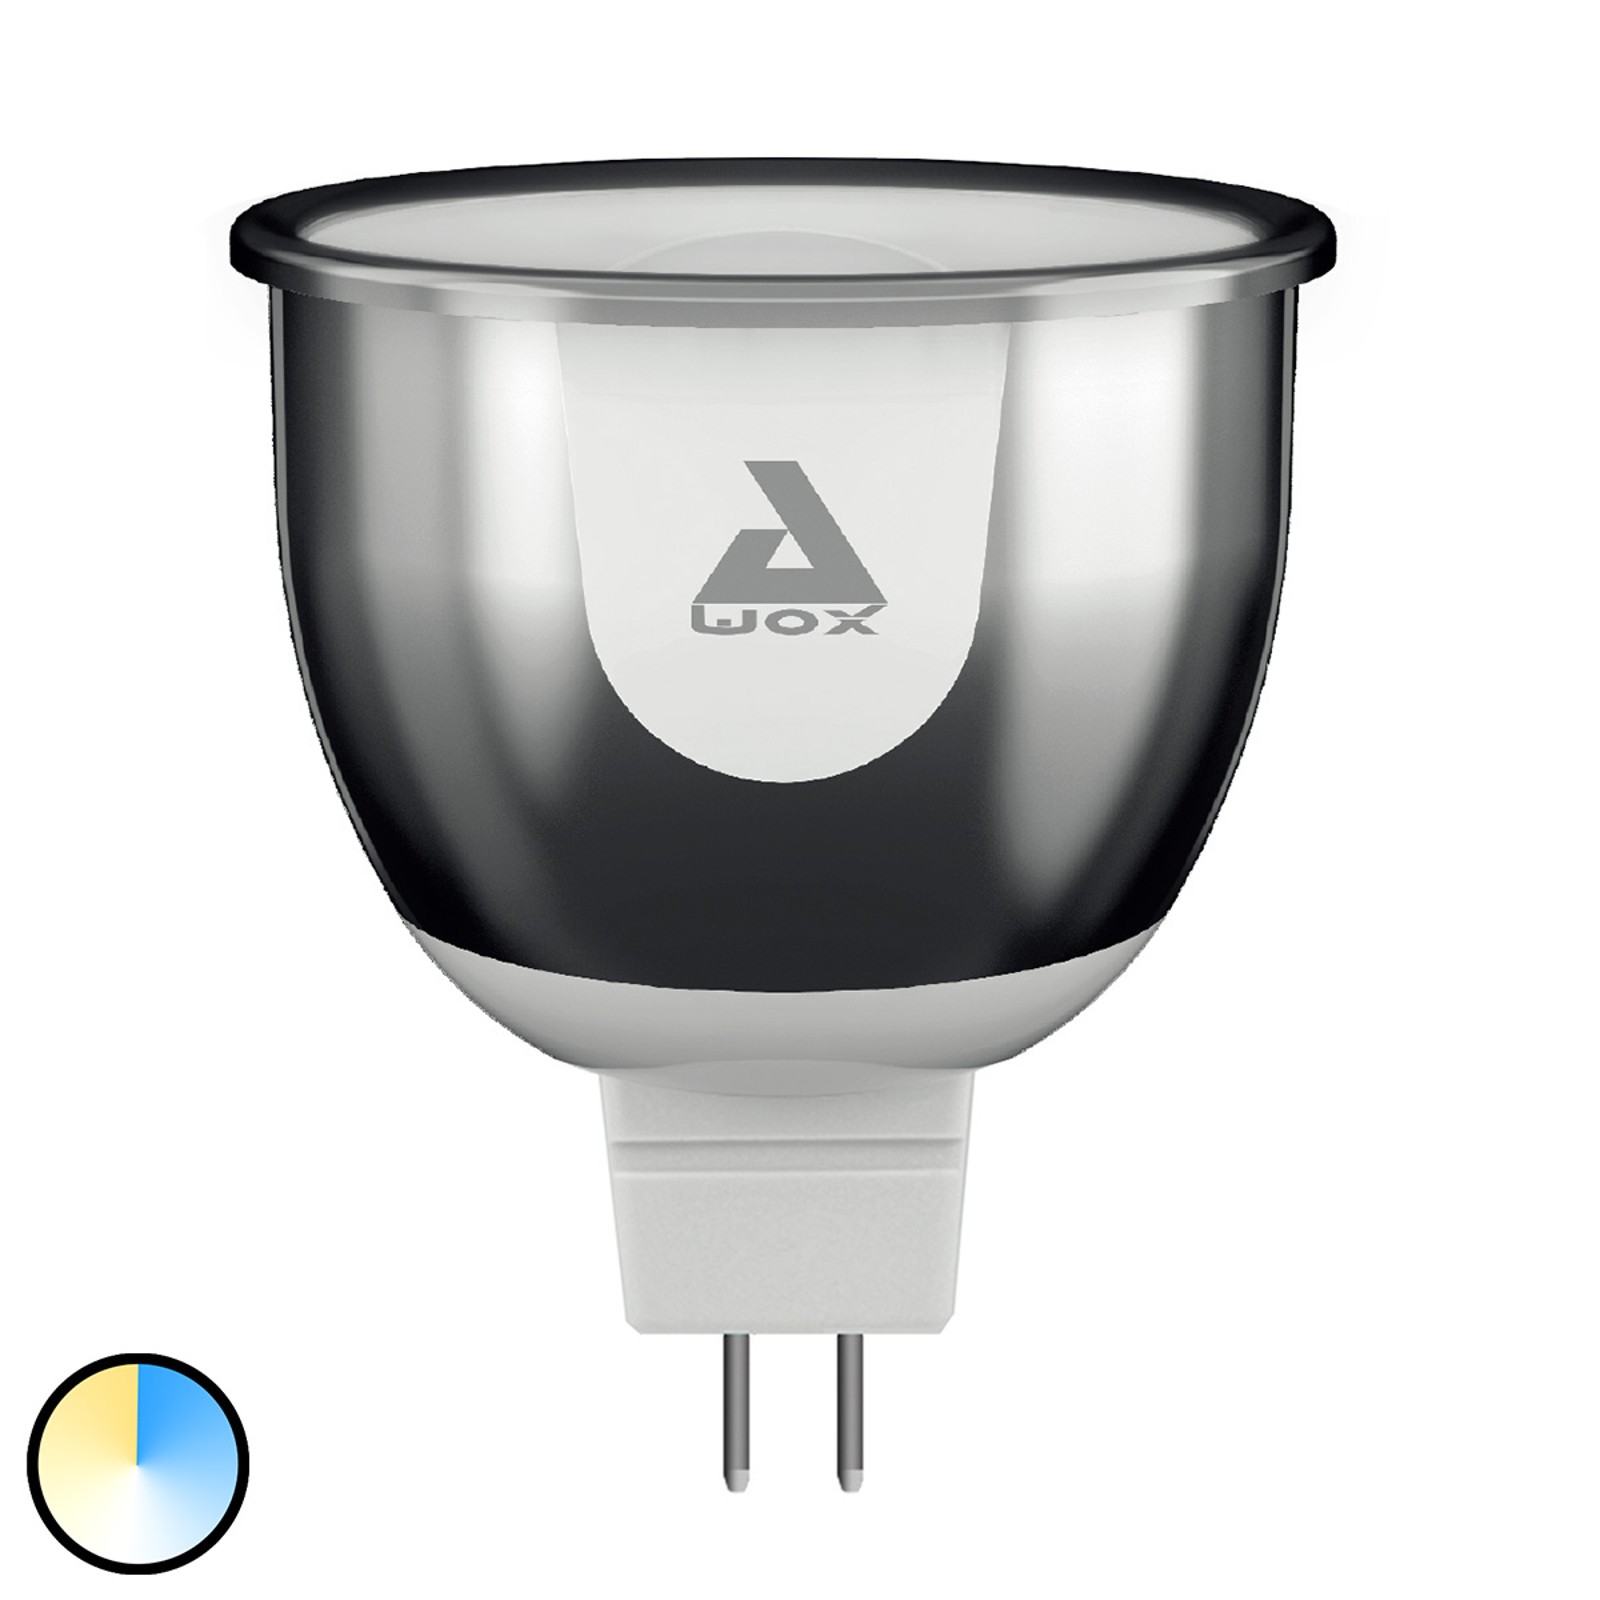 AwoX SmartLIGHT LED-Reflektor GU5.3 2700-6000K 4W